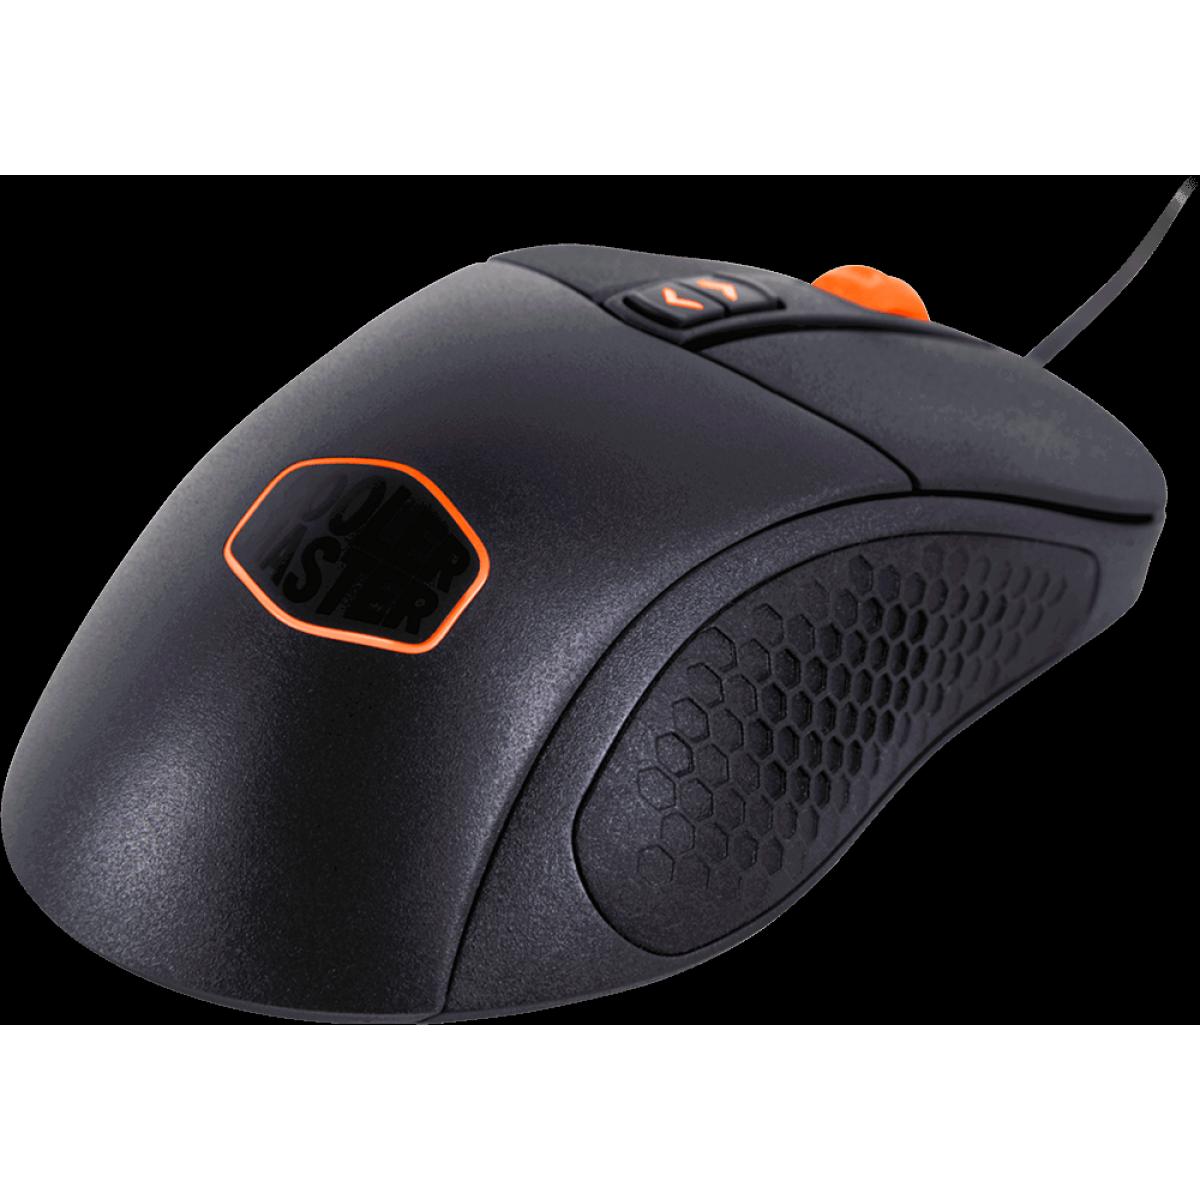 Mouse Gamer Cooler Master MM530 RGB, 12000DPI, 7 Botões Programáveis, SGM-4007-KLLW1